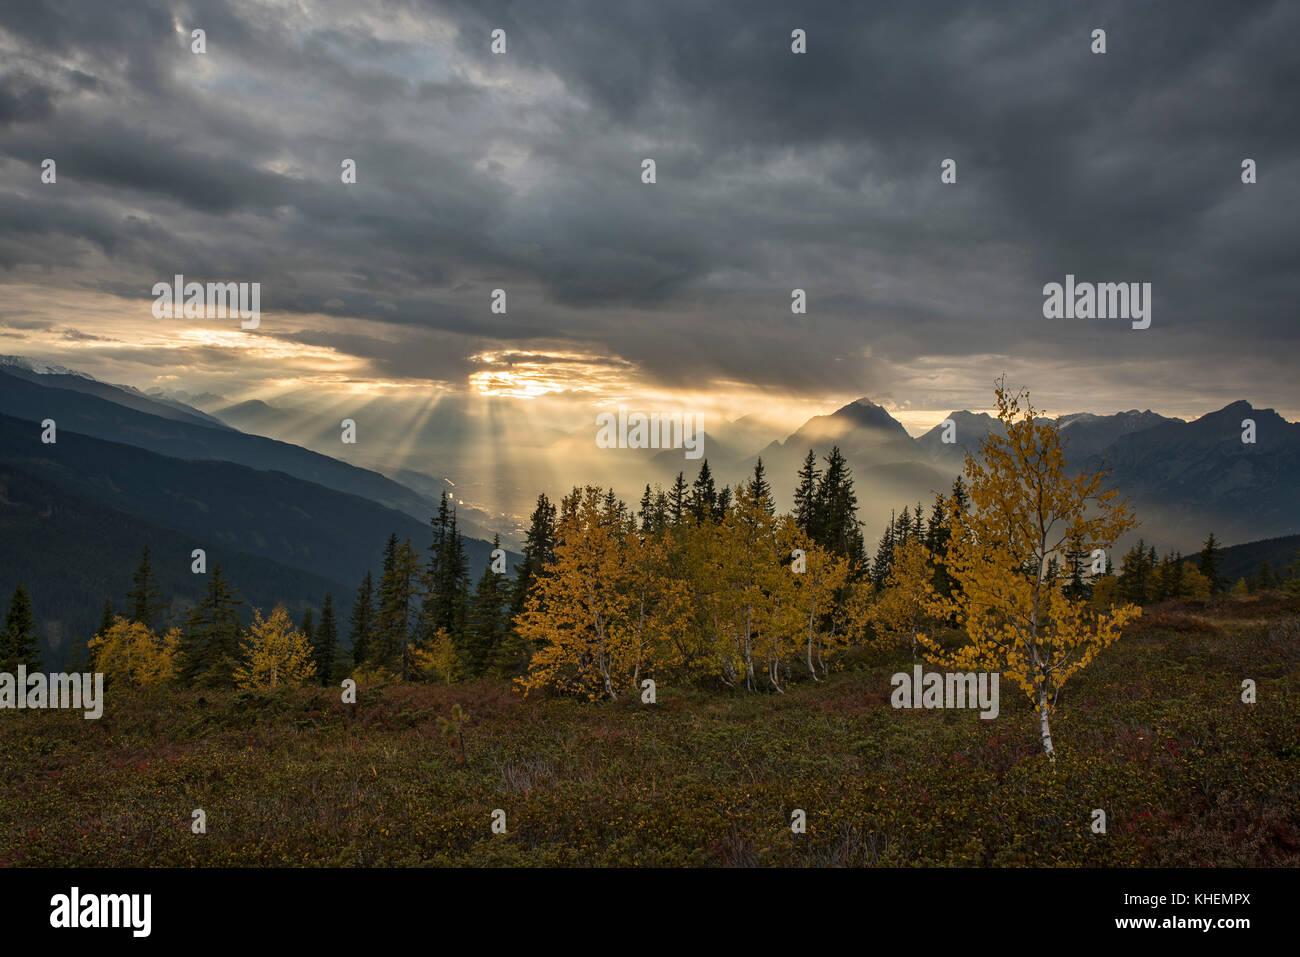 Mountain landscape in autumn, sunshine shines through cloud cover, Inn Valley, Tyrol, Austria - Stock Image